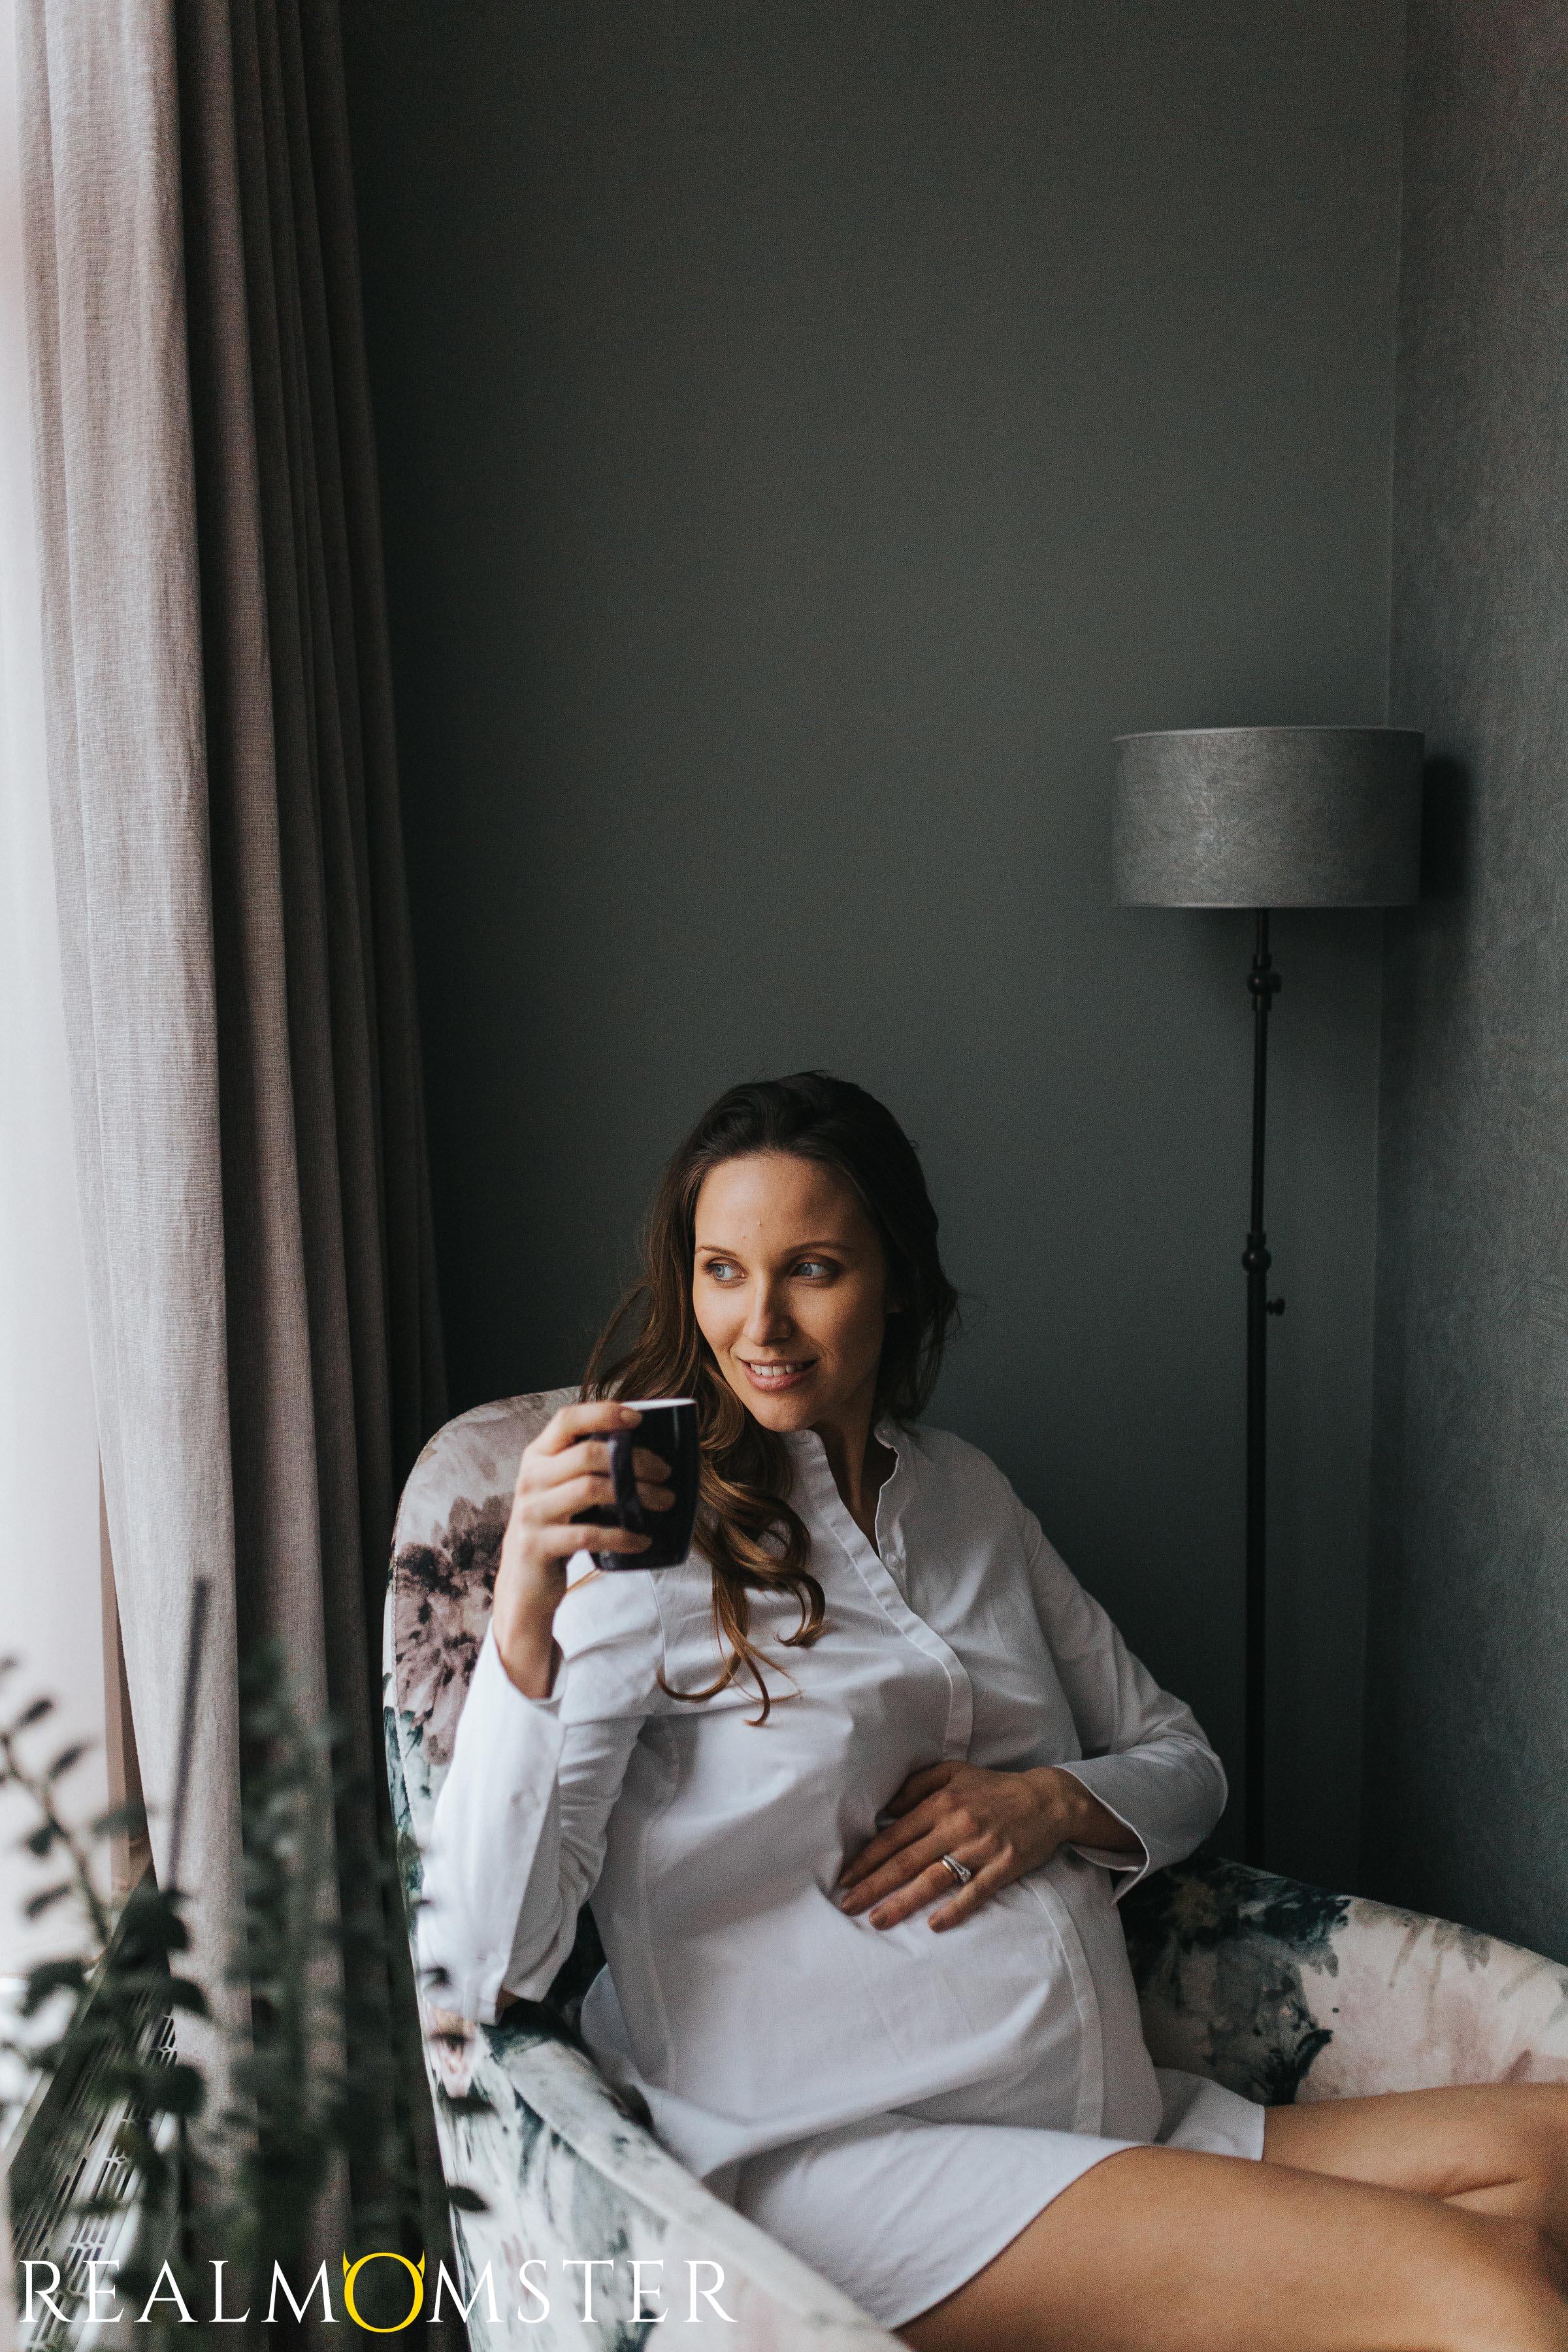 Realmomster mornings with floriana sieswerda motherhood